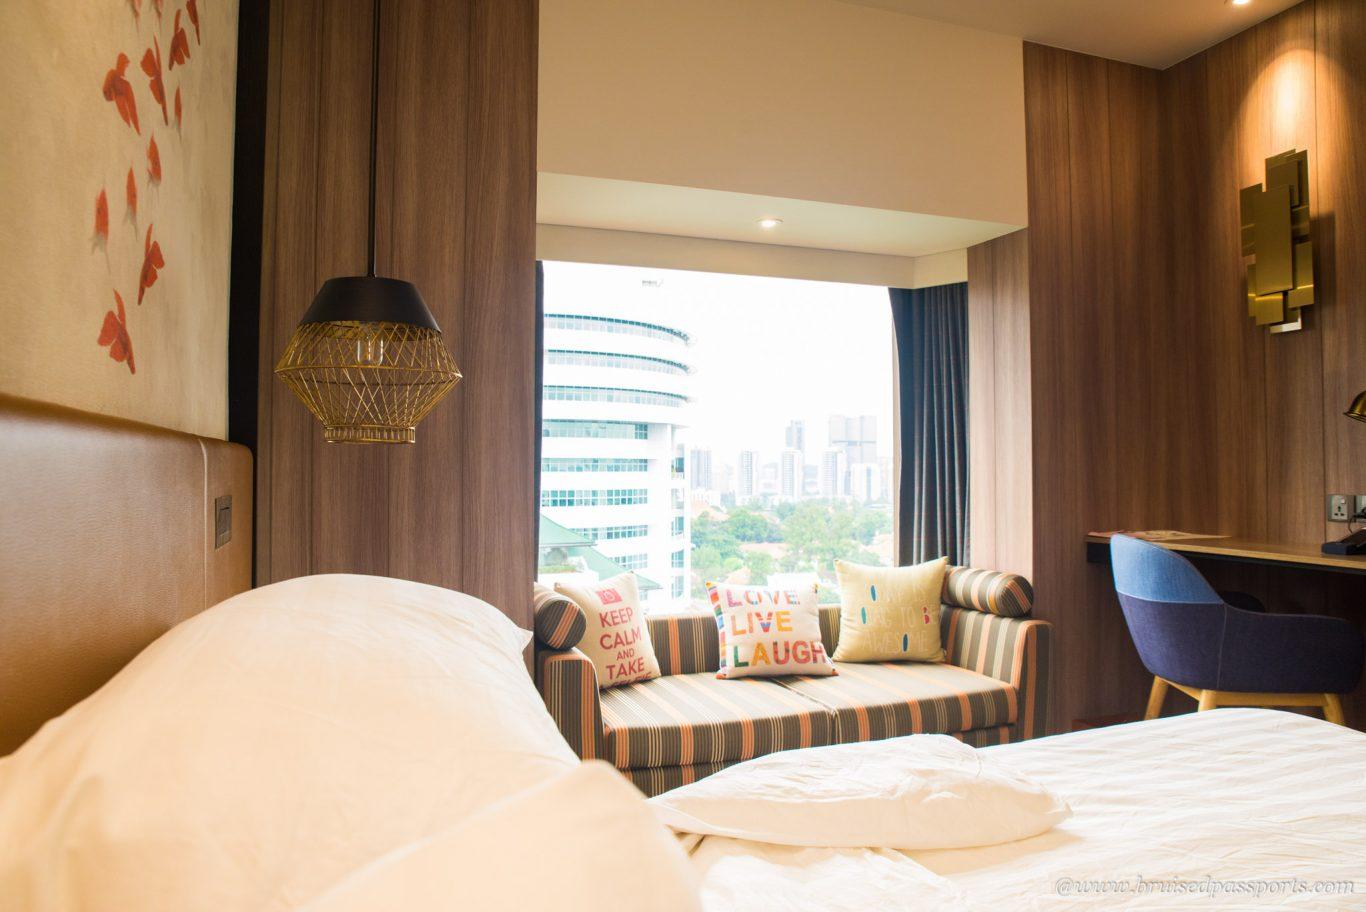 Room at hotel Jen Tanglin Singapore